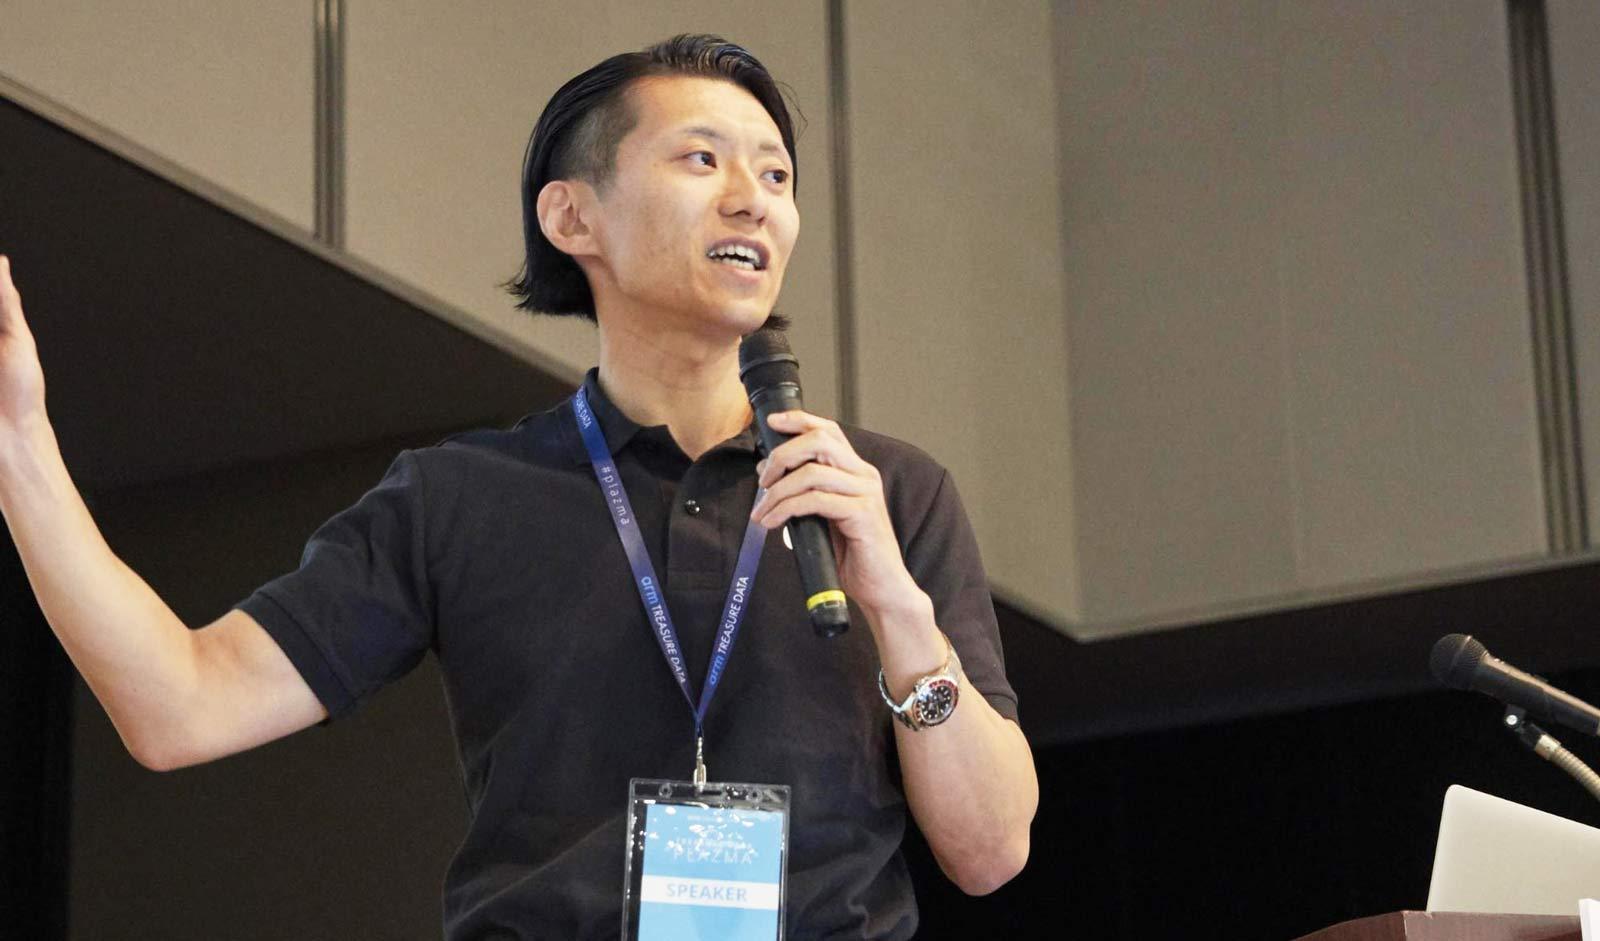 Appier Japan株式会社 エンタープライズソリューションセールス ディレクター 木村 近義氏